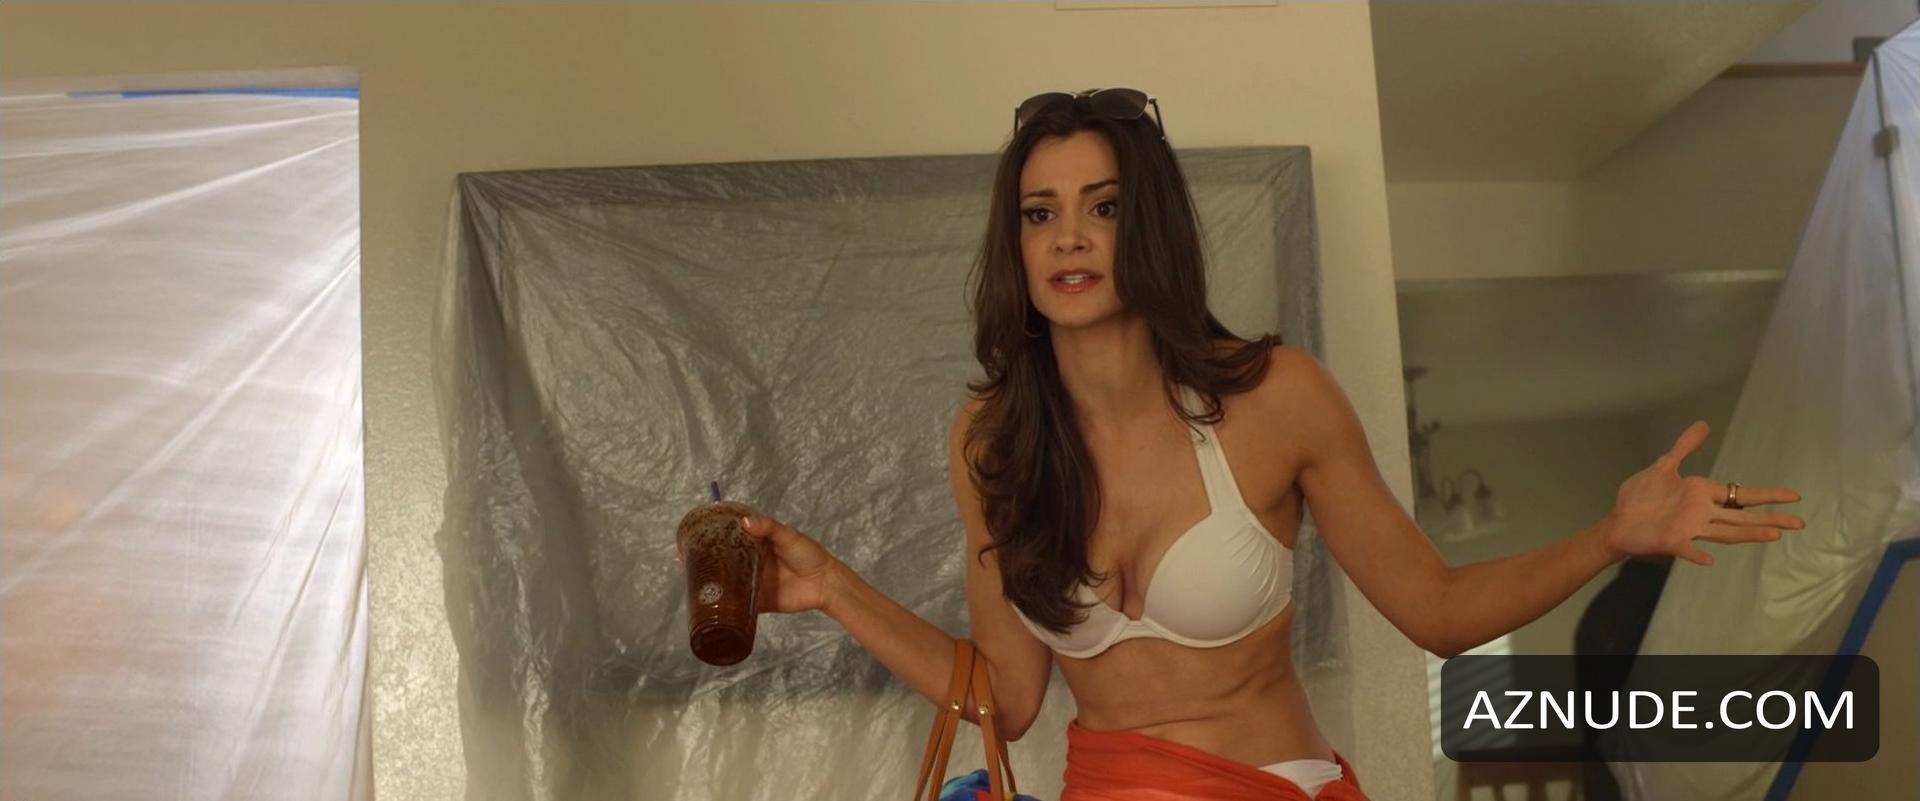 Cindy Ambuehl Nude Top browse celebrity bikini images - page 243 - aznude